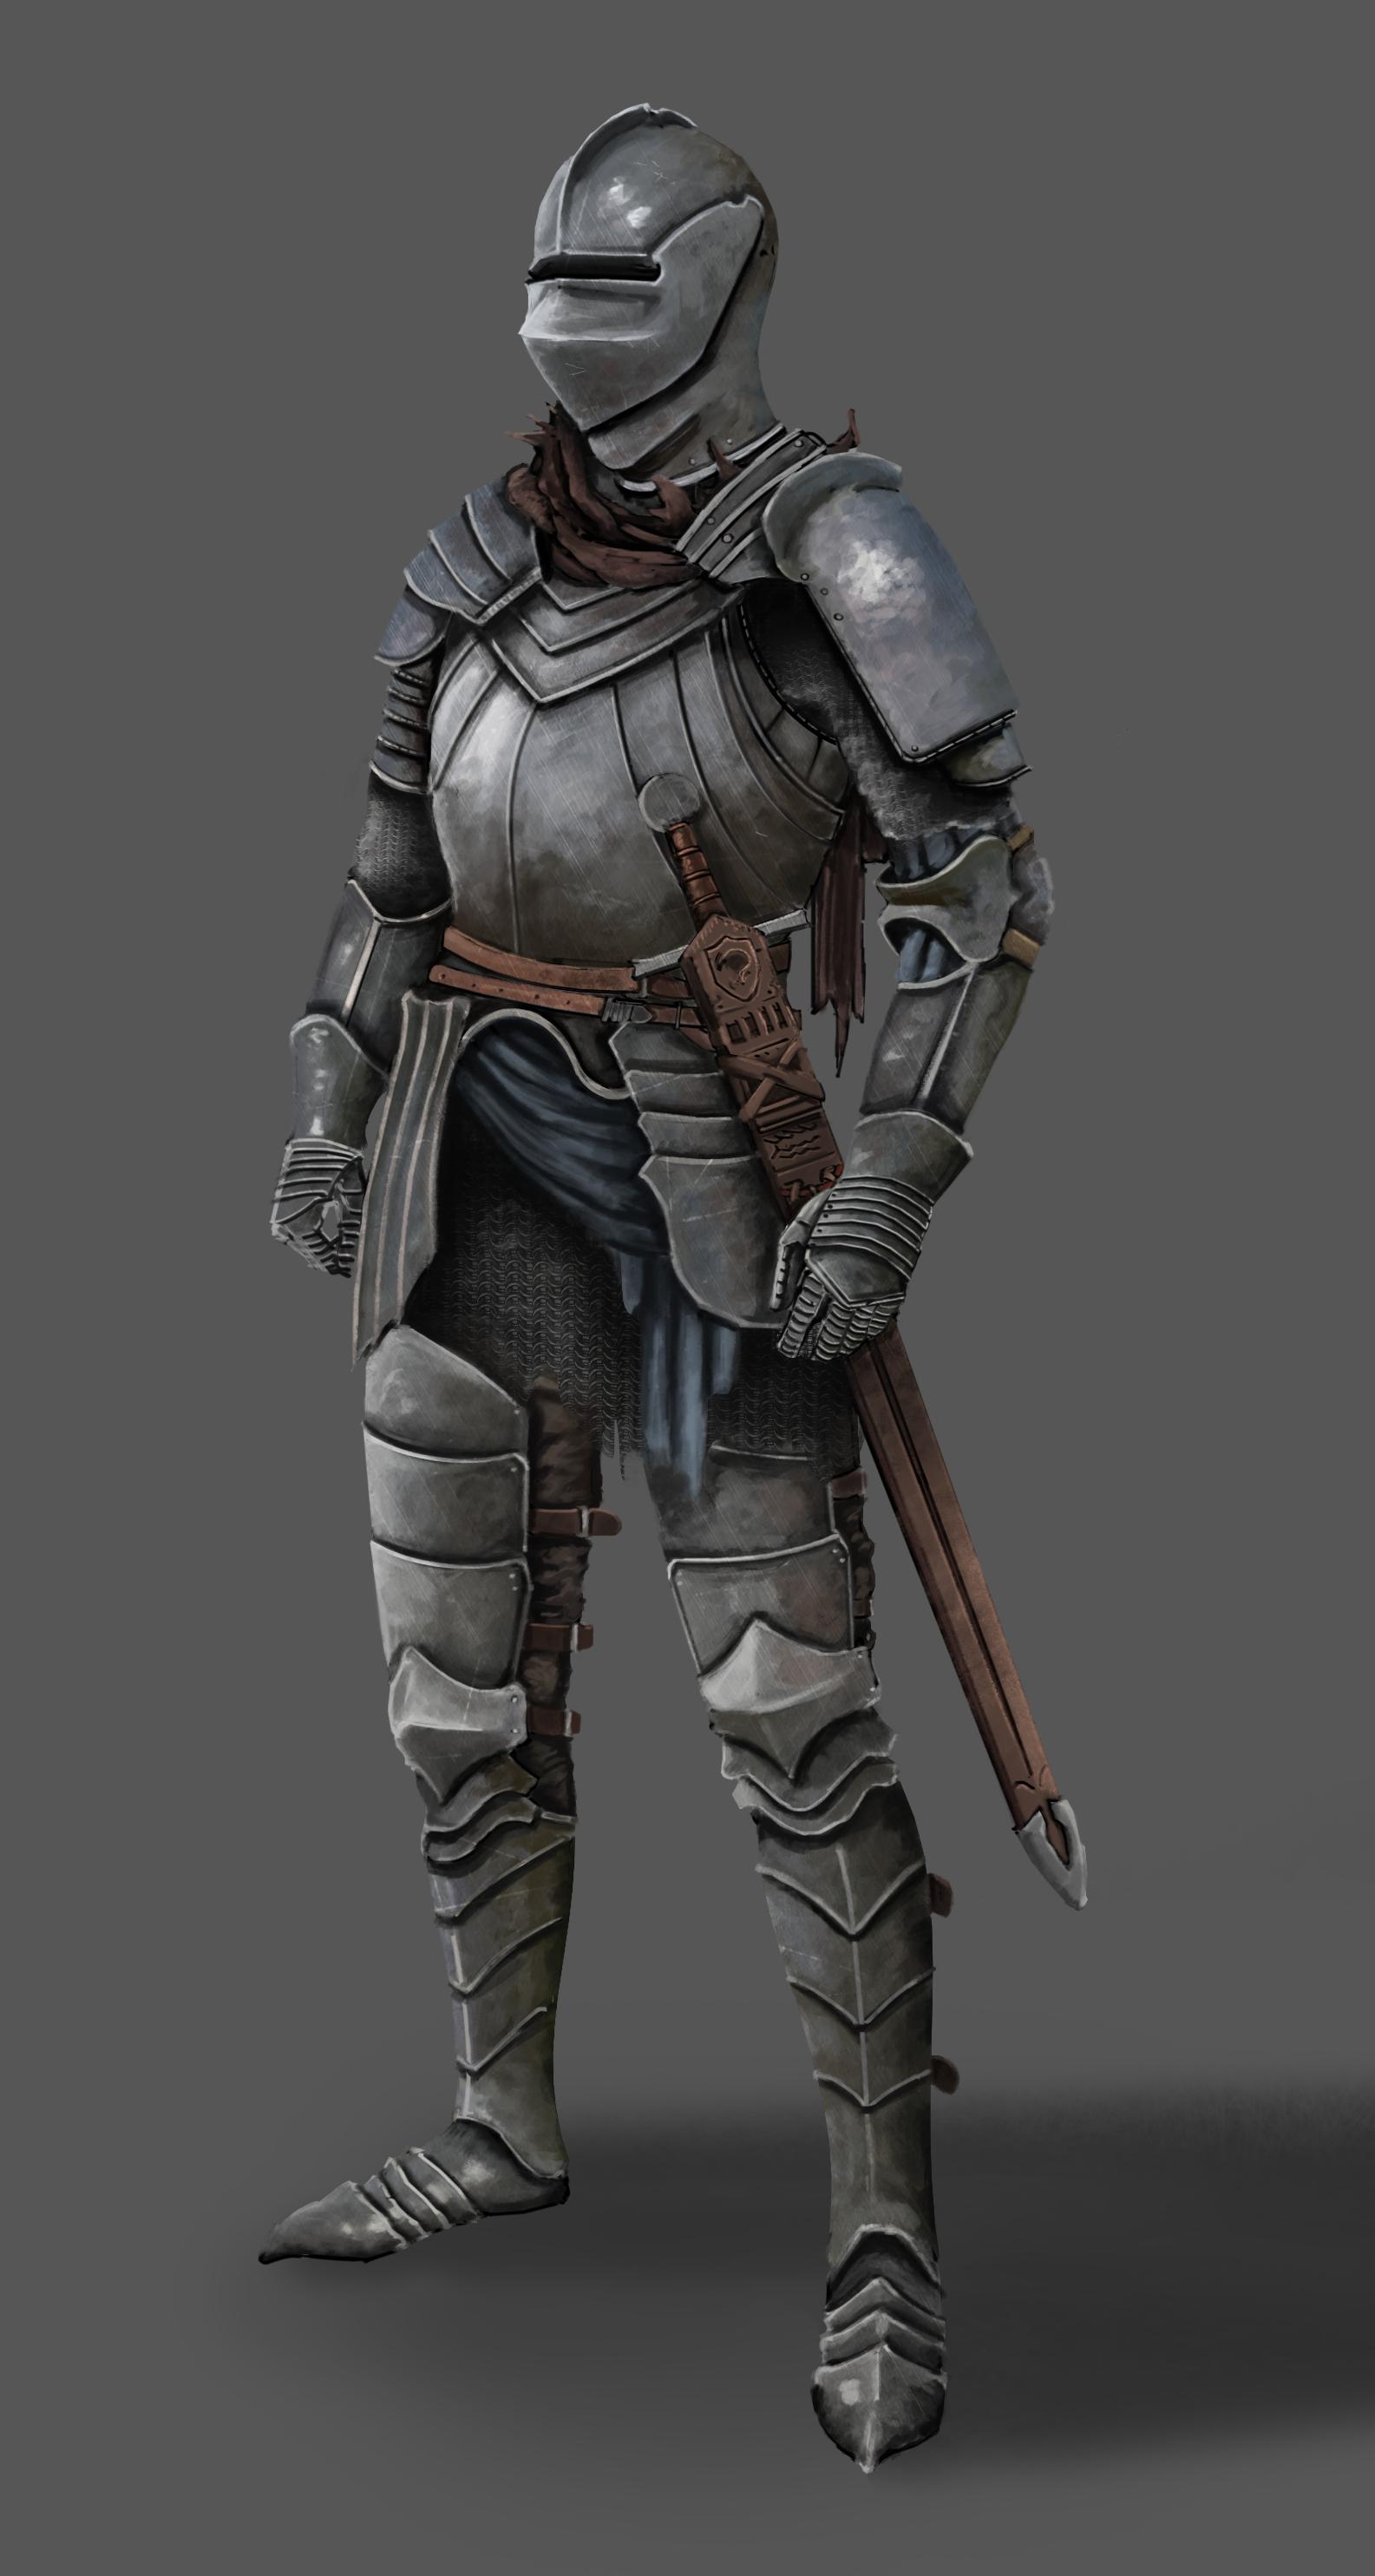 Knight armor design 1 by FutureKaze on DeviantArt